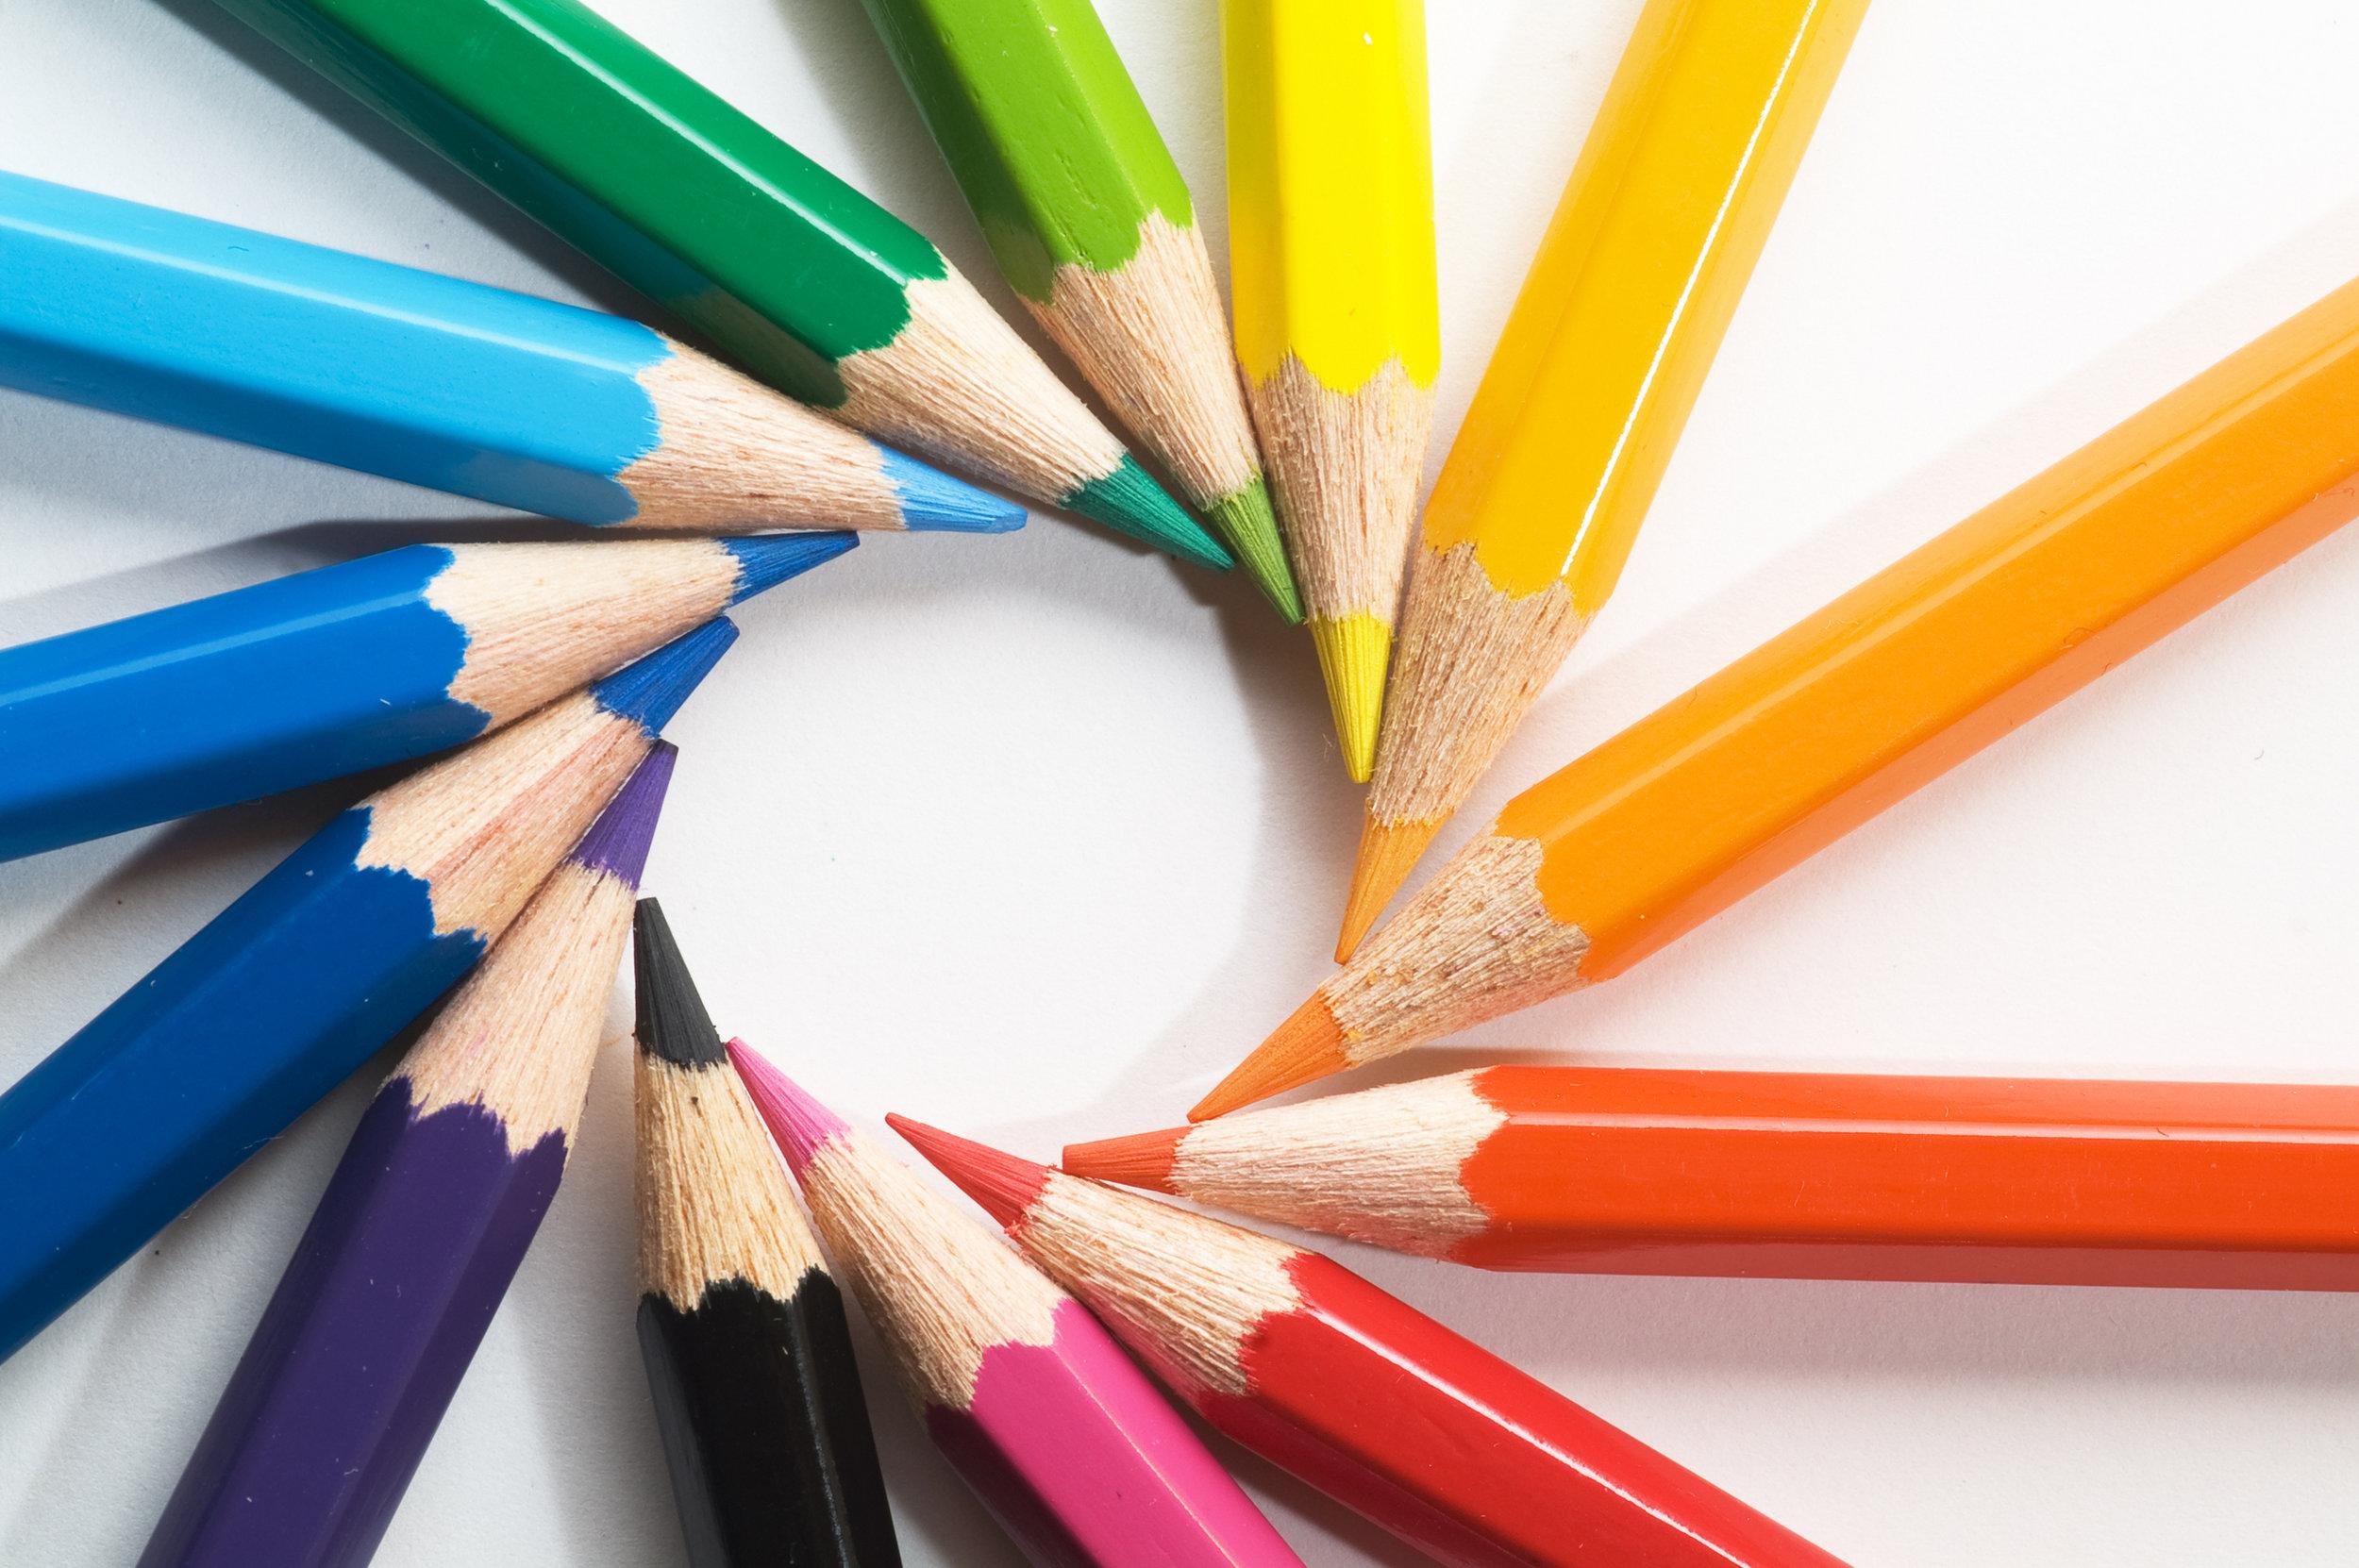 Colored-pencils-pencils-22186520-2560-1702.jpg